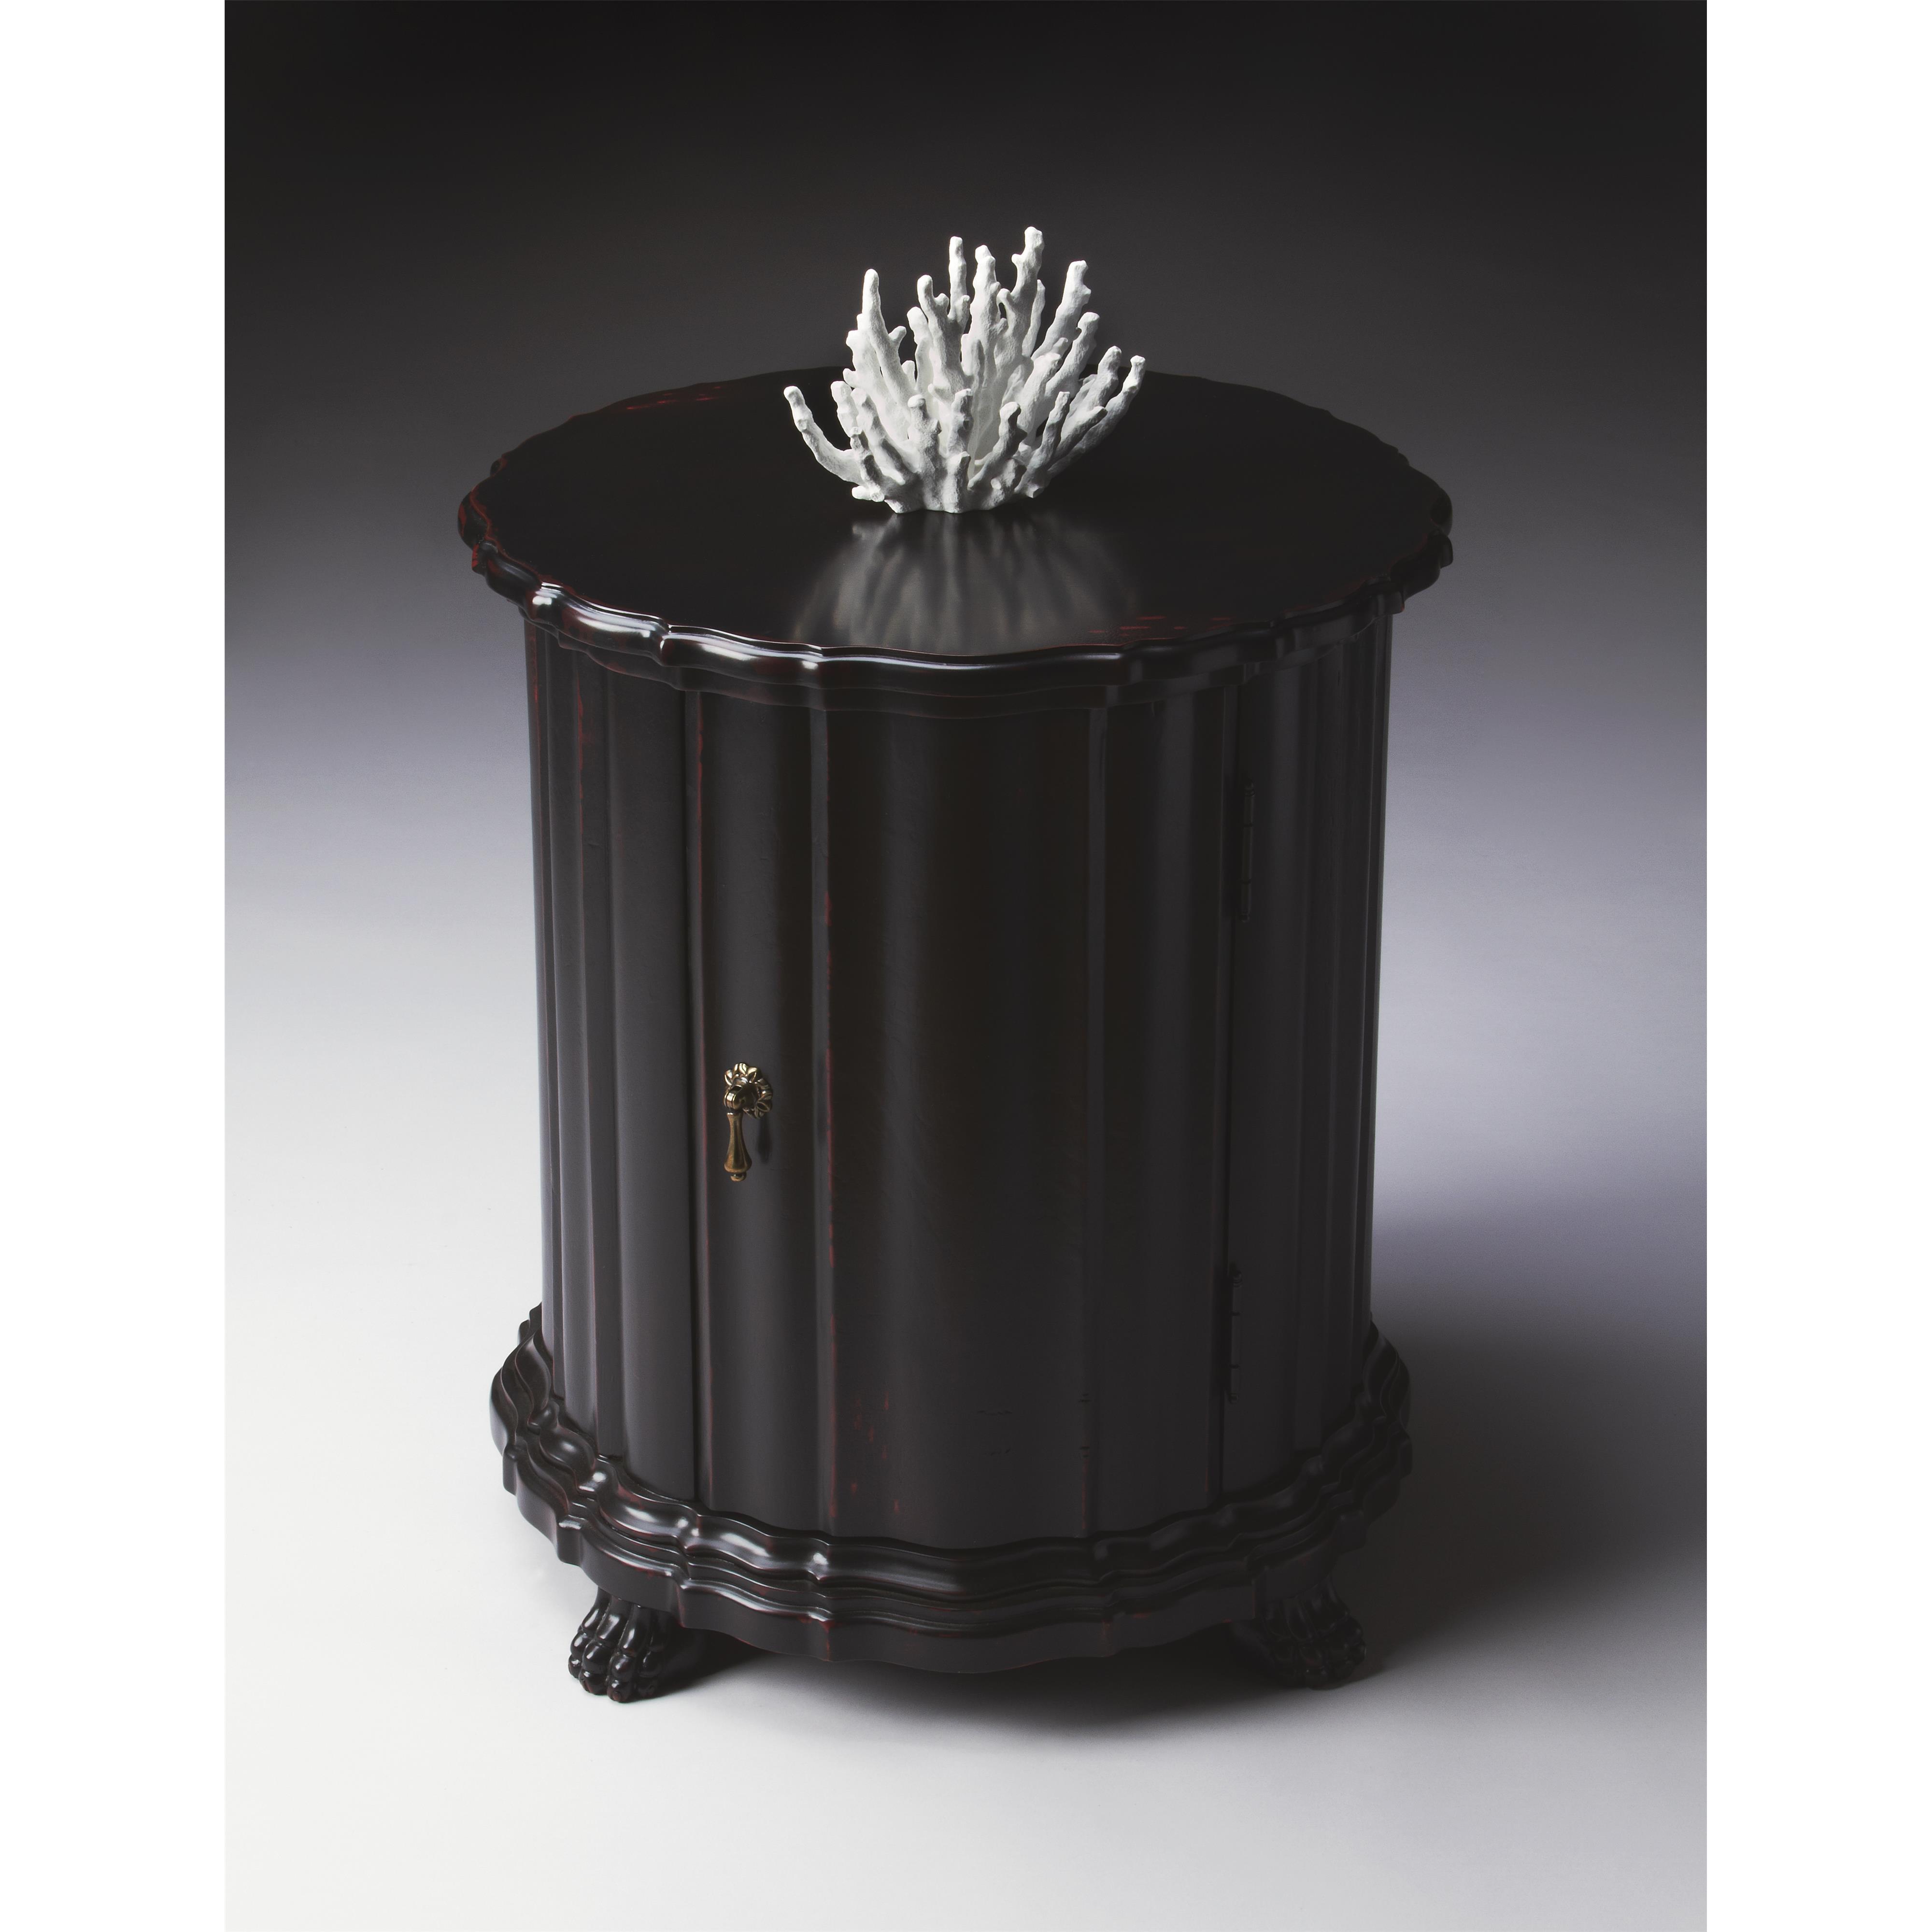 Butler Specialty Company Artist's Originals Drum Table - Item Number: 571136